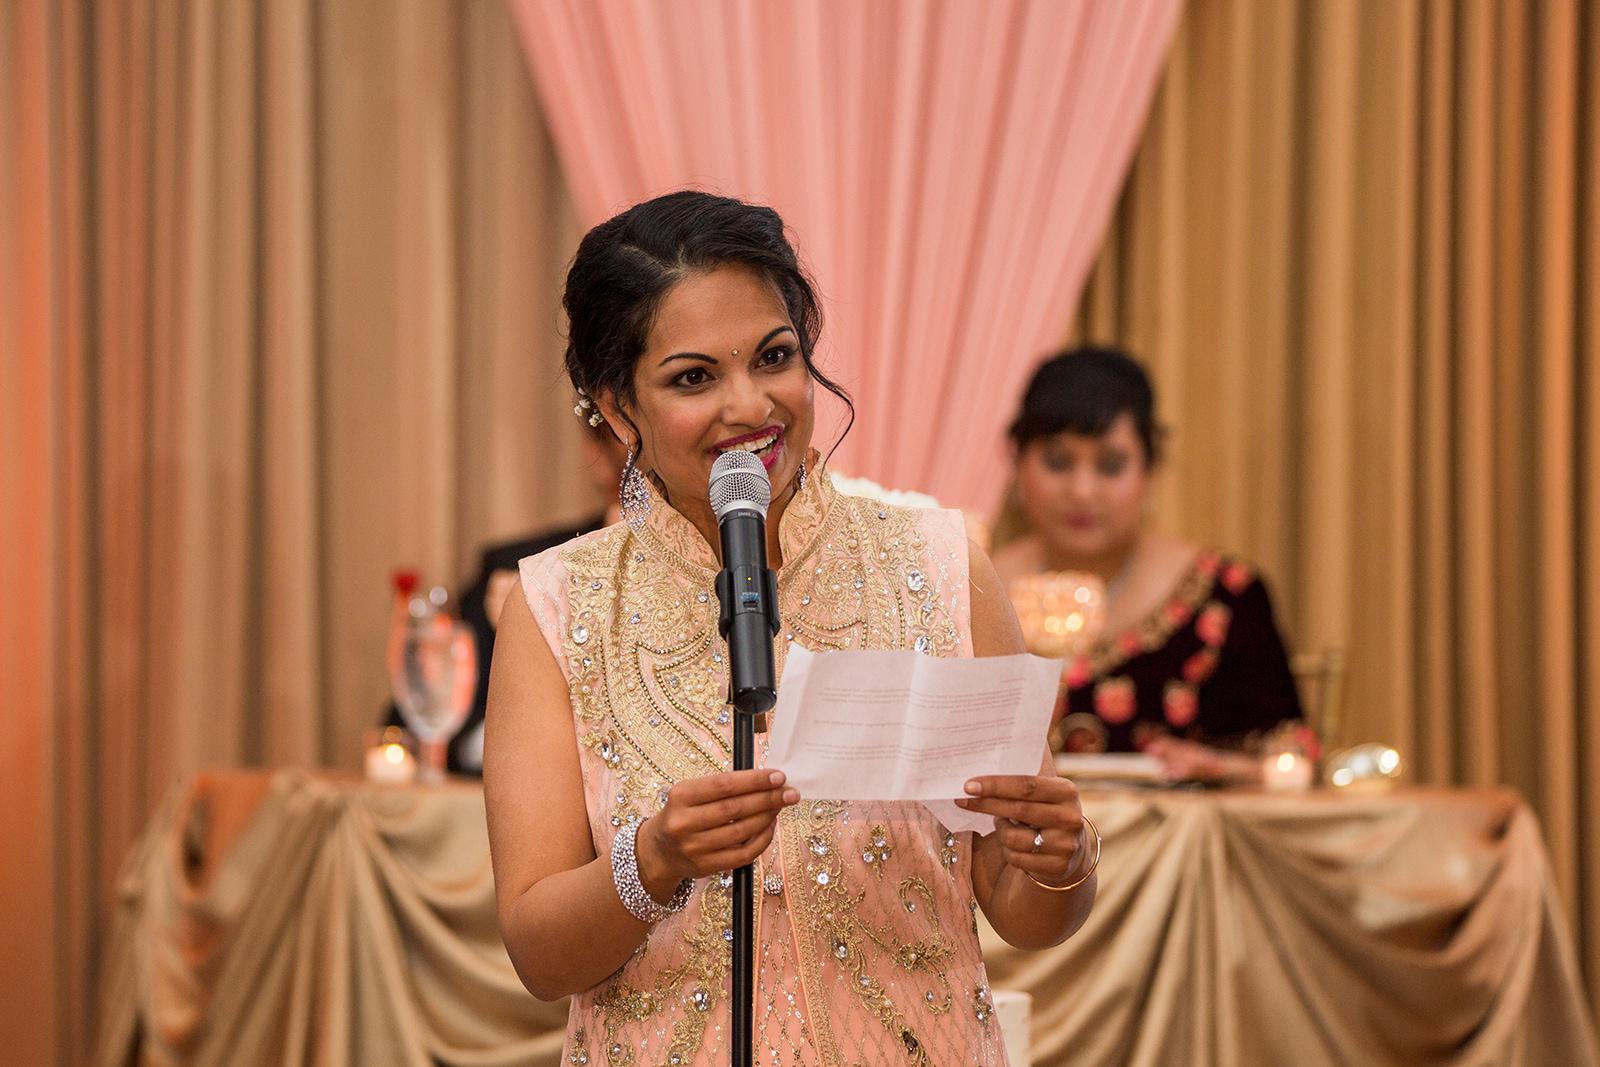 Le Cape Weddings - South Asian Wedding - Ishani and Sidhart - Wedding Reception-18.jpg